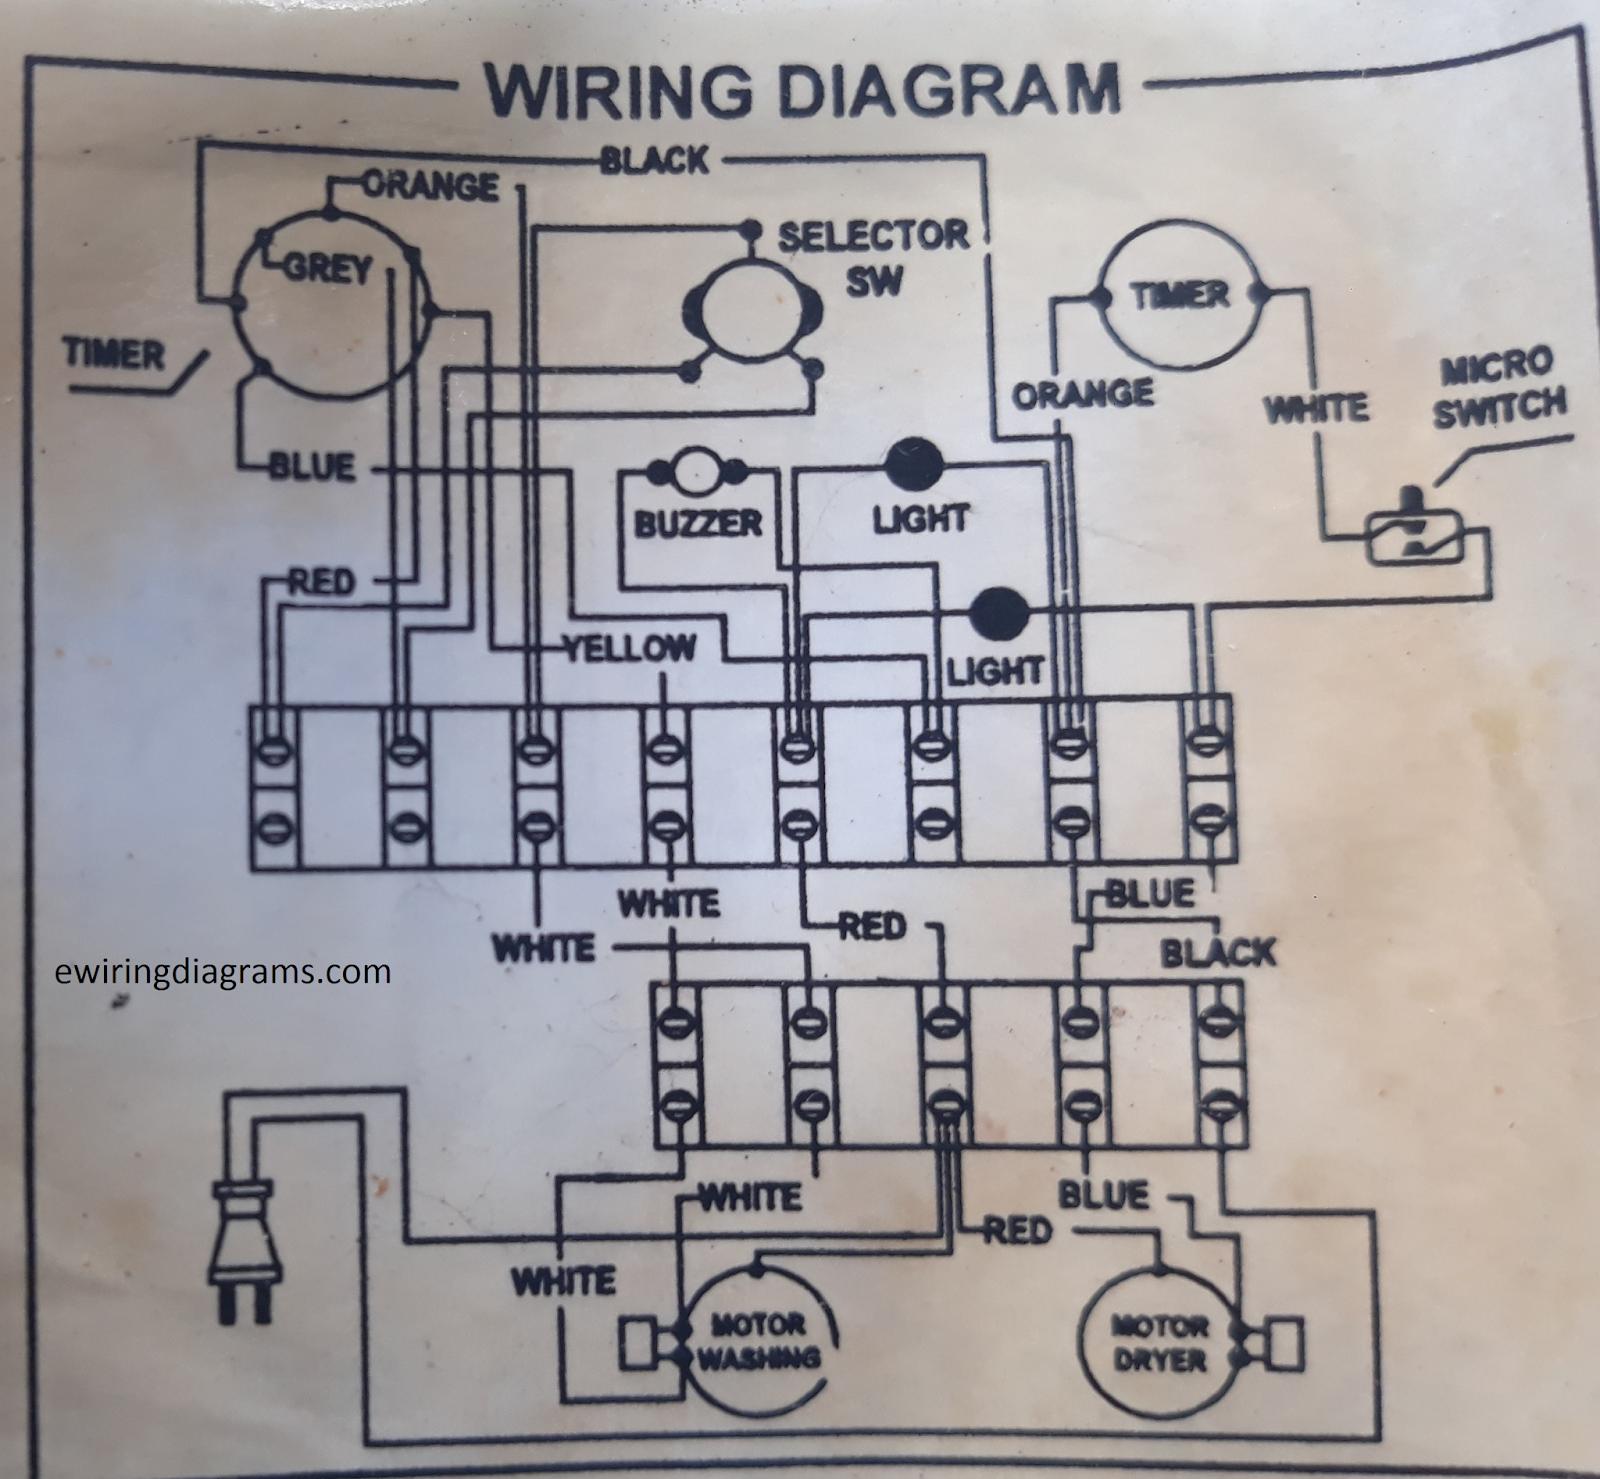 [QMVU_8575]  OR_1890] Microwave Oven Wiring Diagram On Dishwasher Pump Motor Wiring  Diagram Wiring Diagram | Videocon Washing Machine Wiring Diagram |  | Funi Wigeg Mohammedshrine Librar Wiring 101